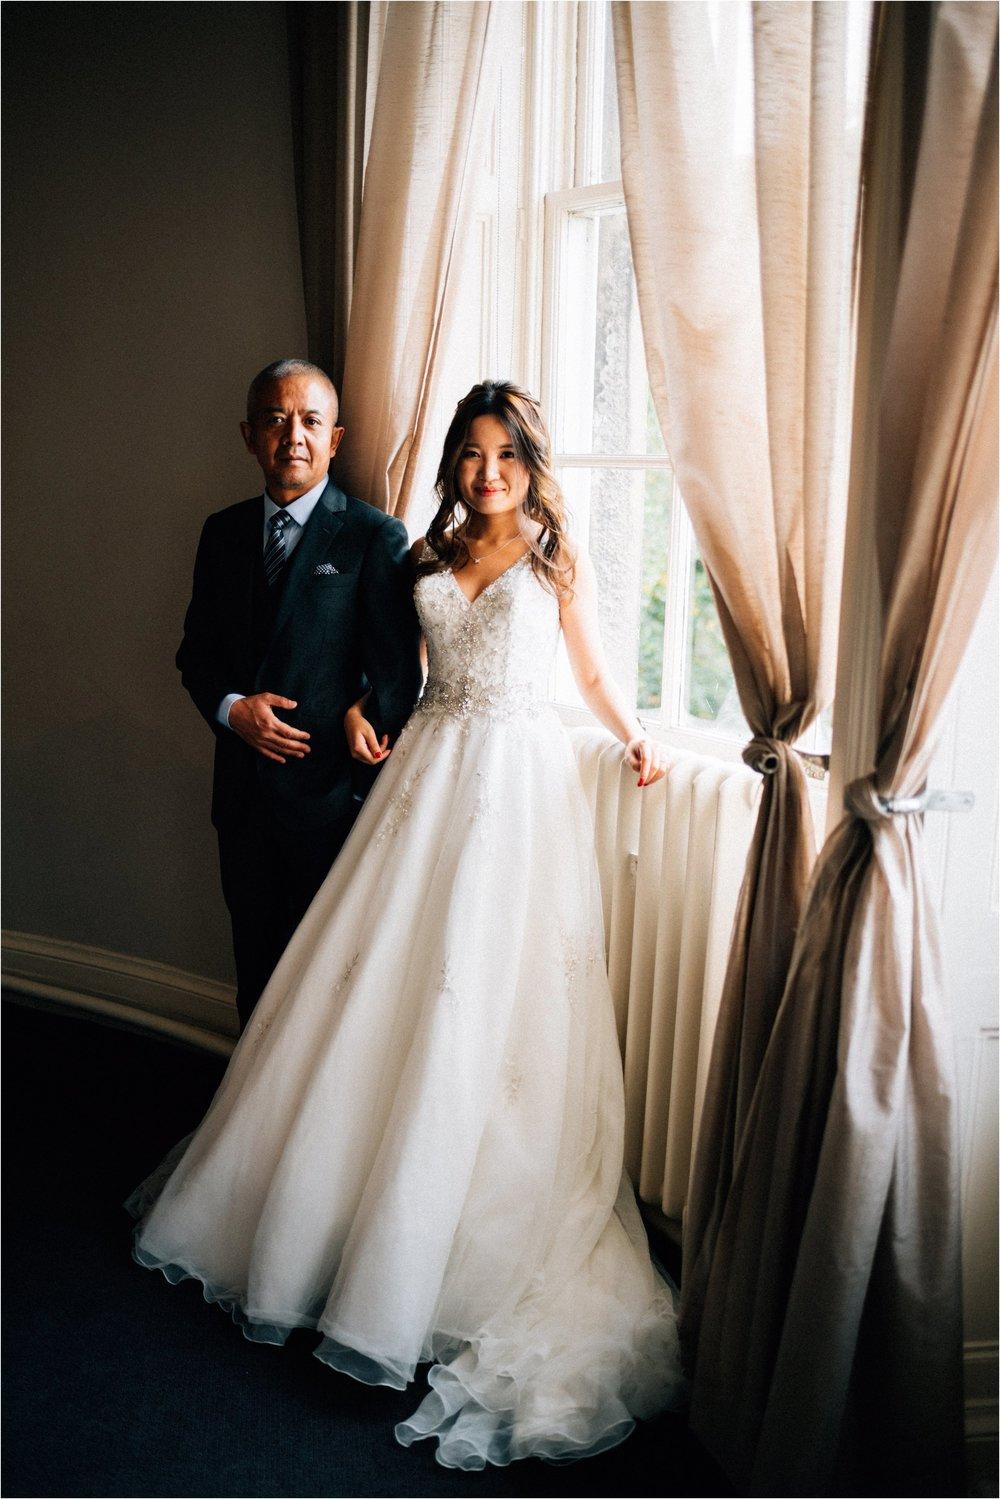 York city elopement wedding photographer_0027.jpg